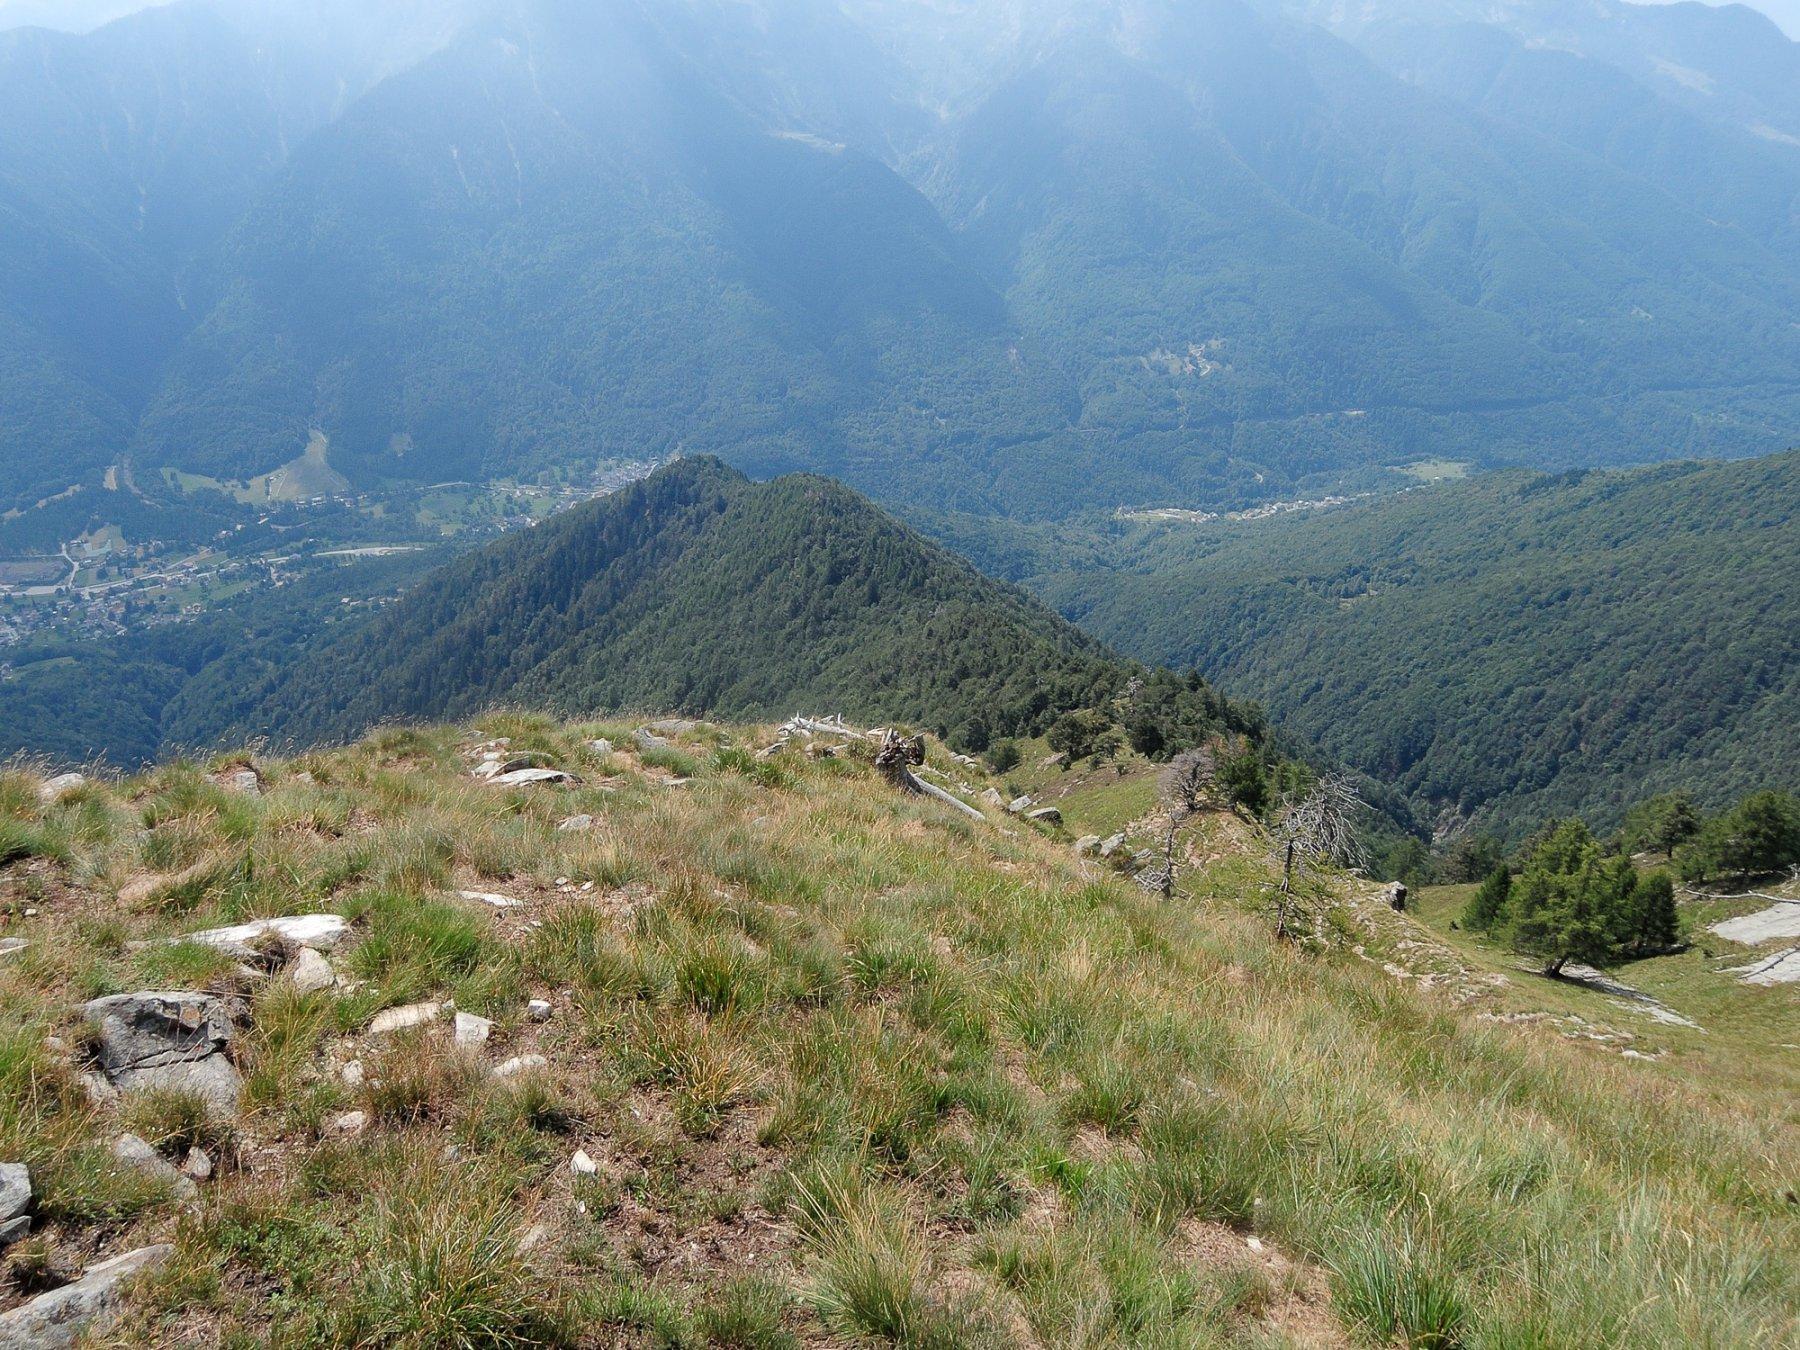 Cresta Sud del Margineta, Costa Regada, percorsa in discesa